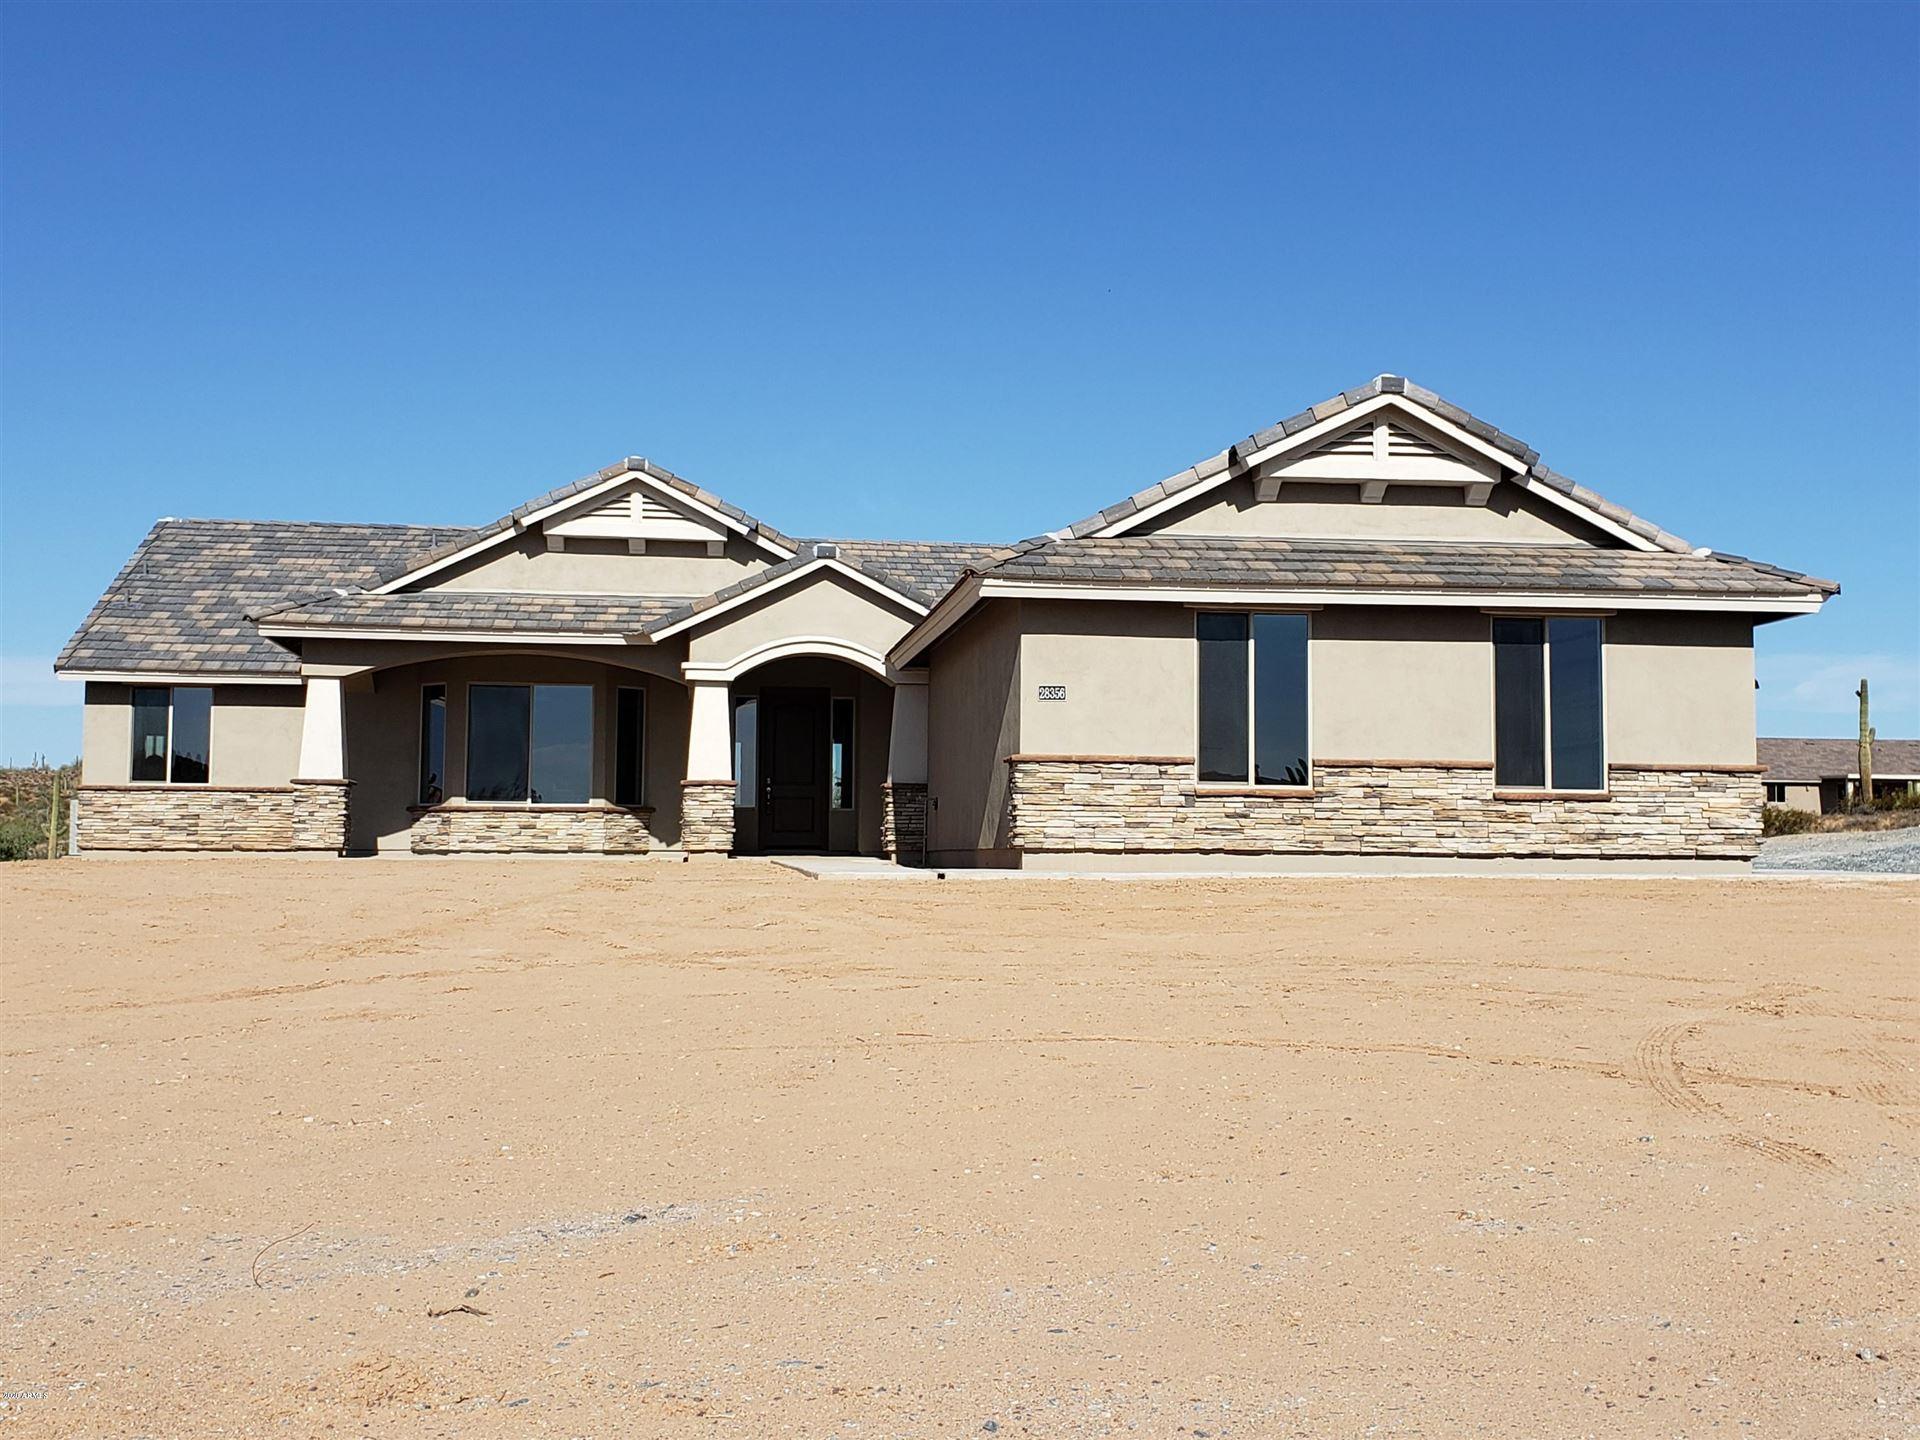 2007 W JOSIAH Trail, Queen Creek, AZ 85142 - #: 6096127